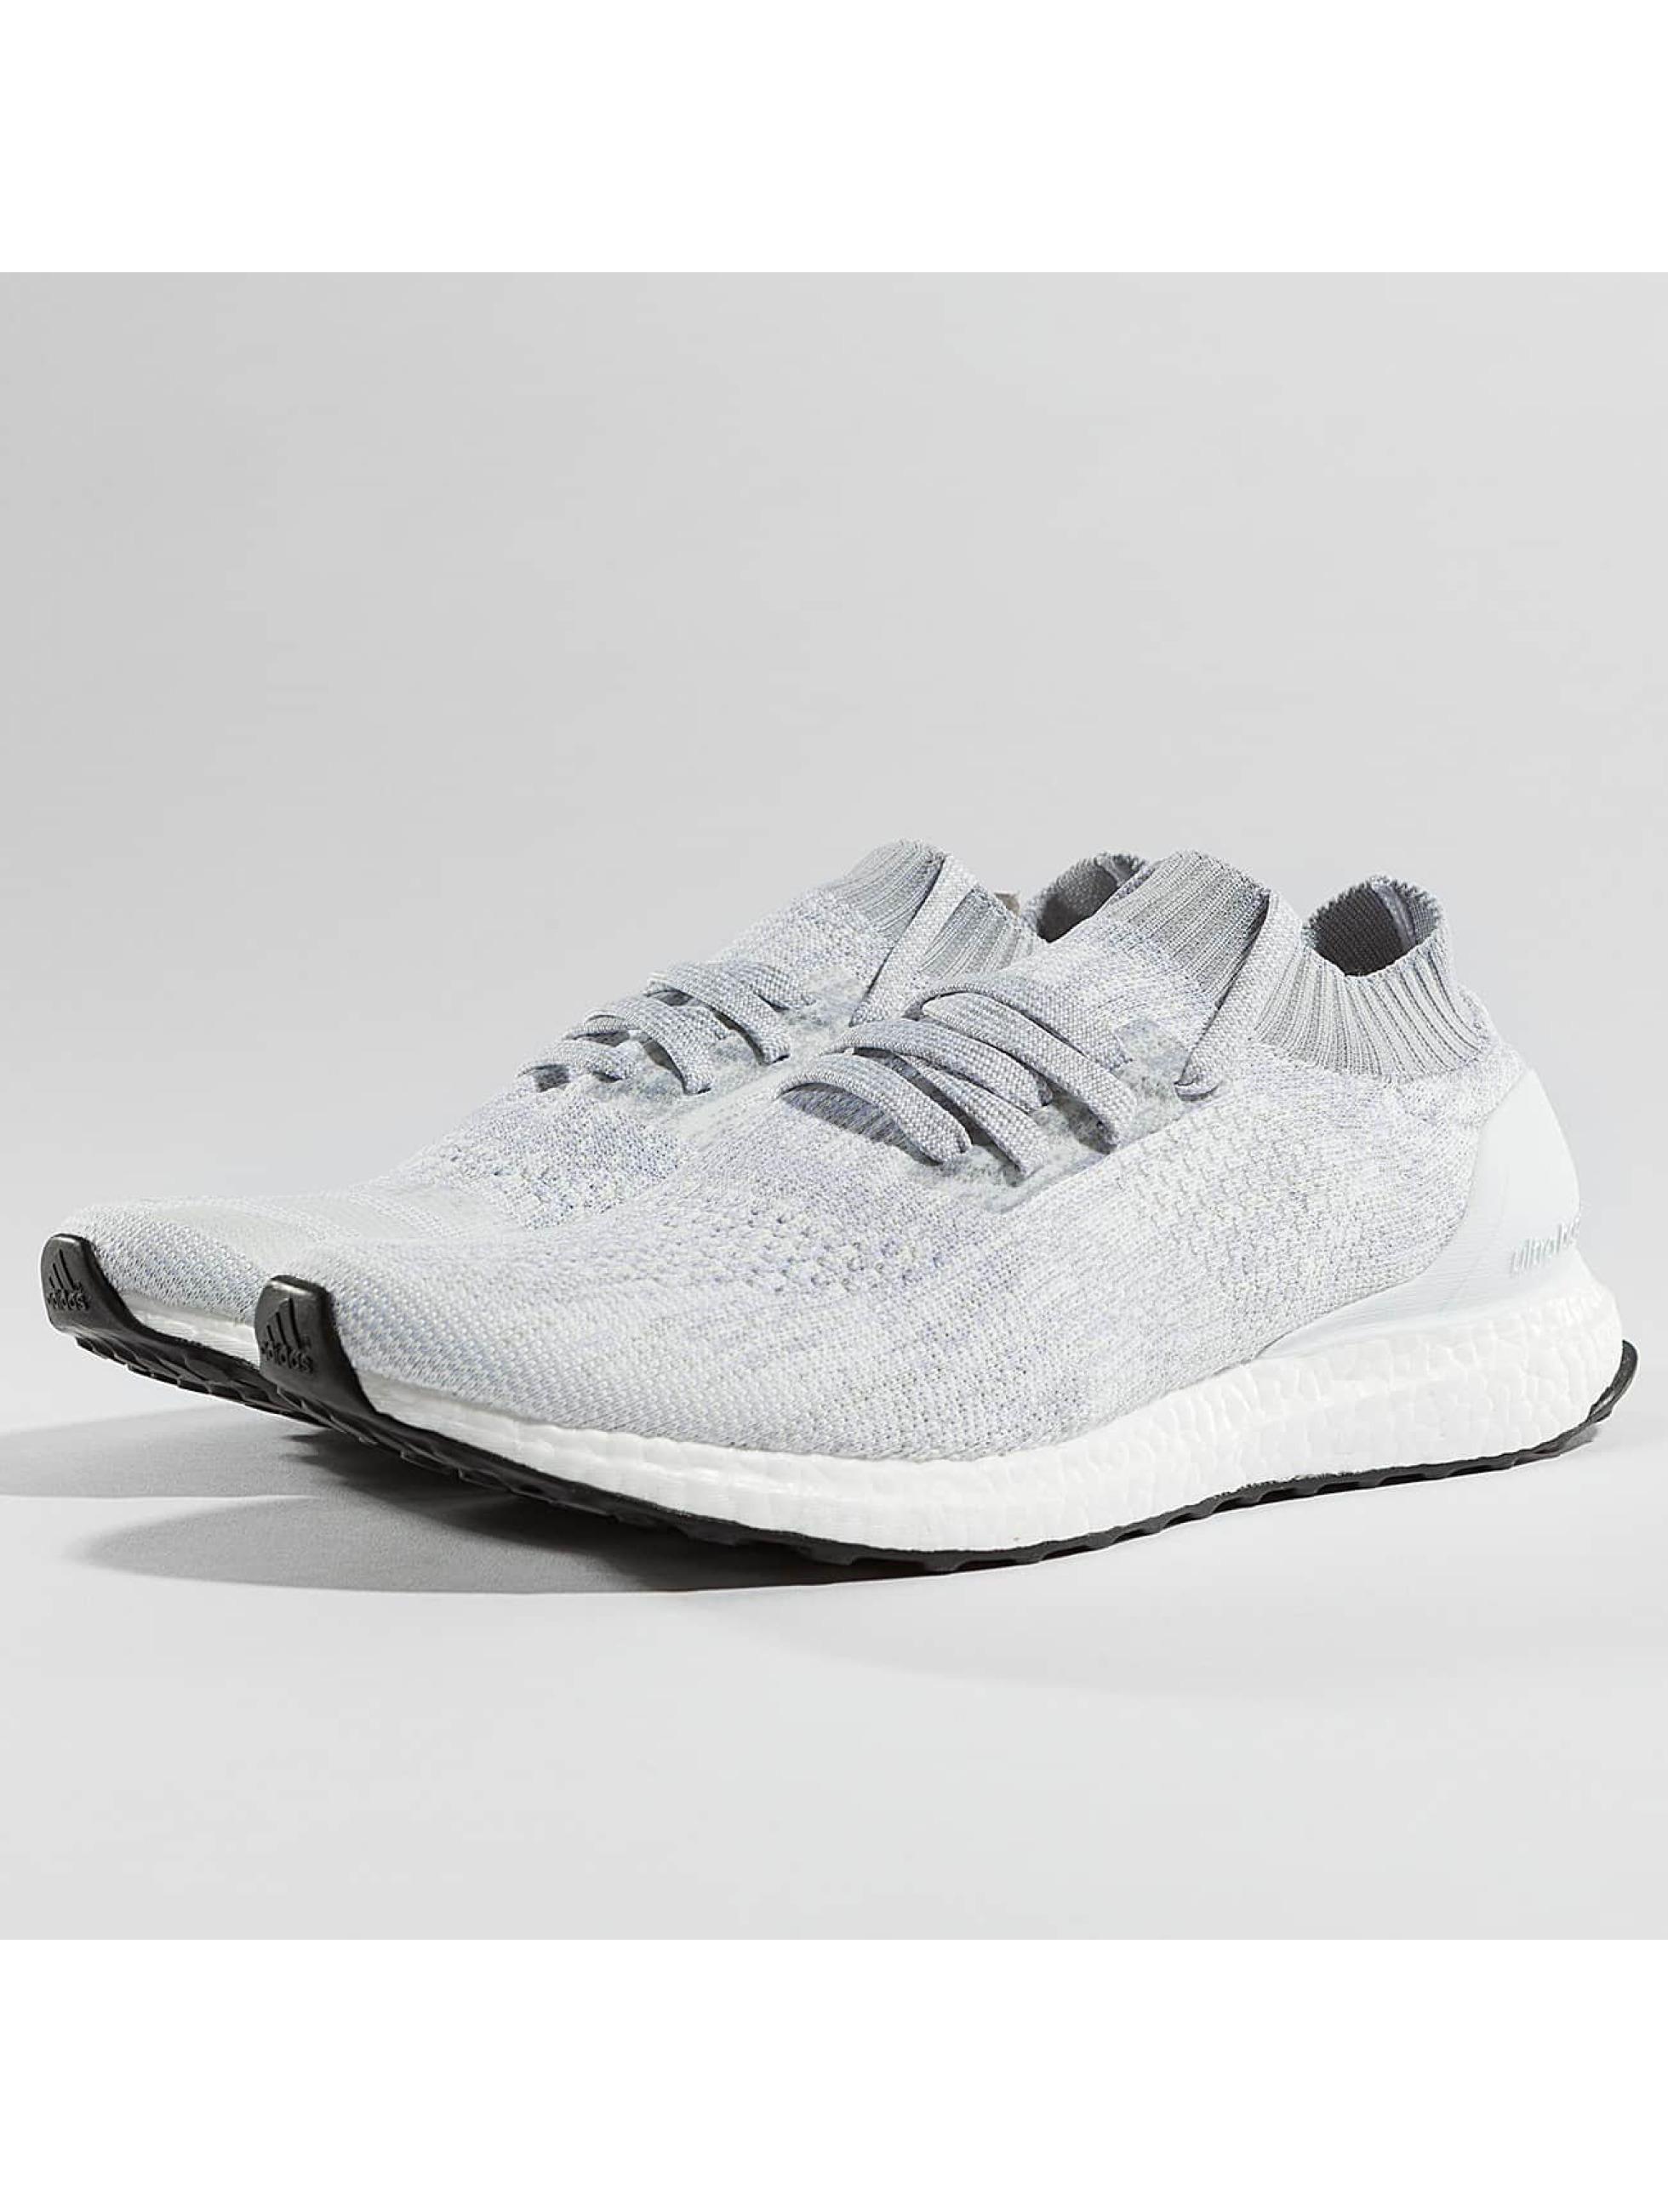 adidas Männer Sneaker Ultra Boost Uncaged in weiß